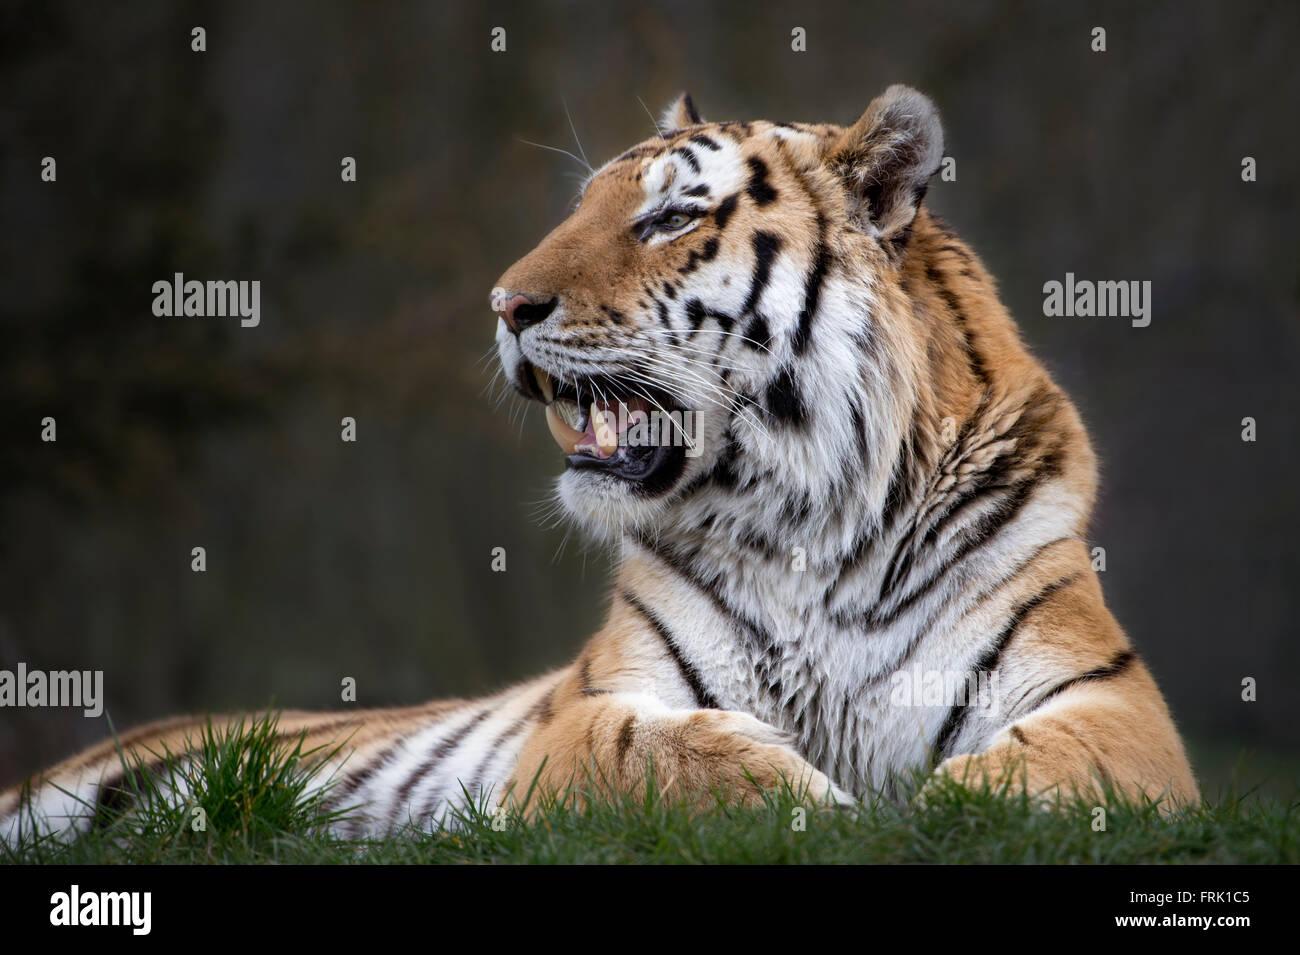 683045674 Tiger Fangs Stock Photos & Tiger Fangs Stock Images - Alamy